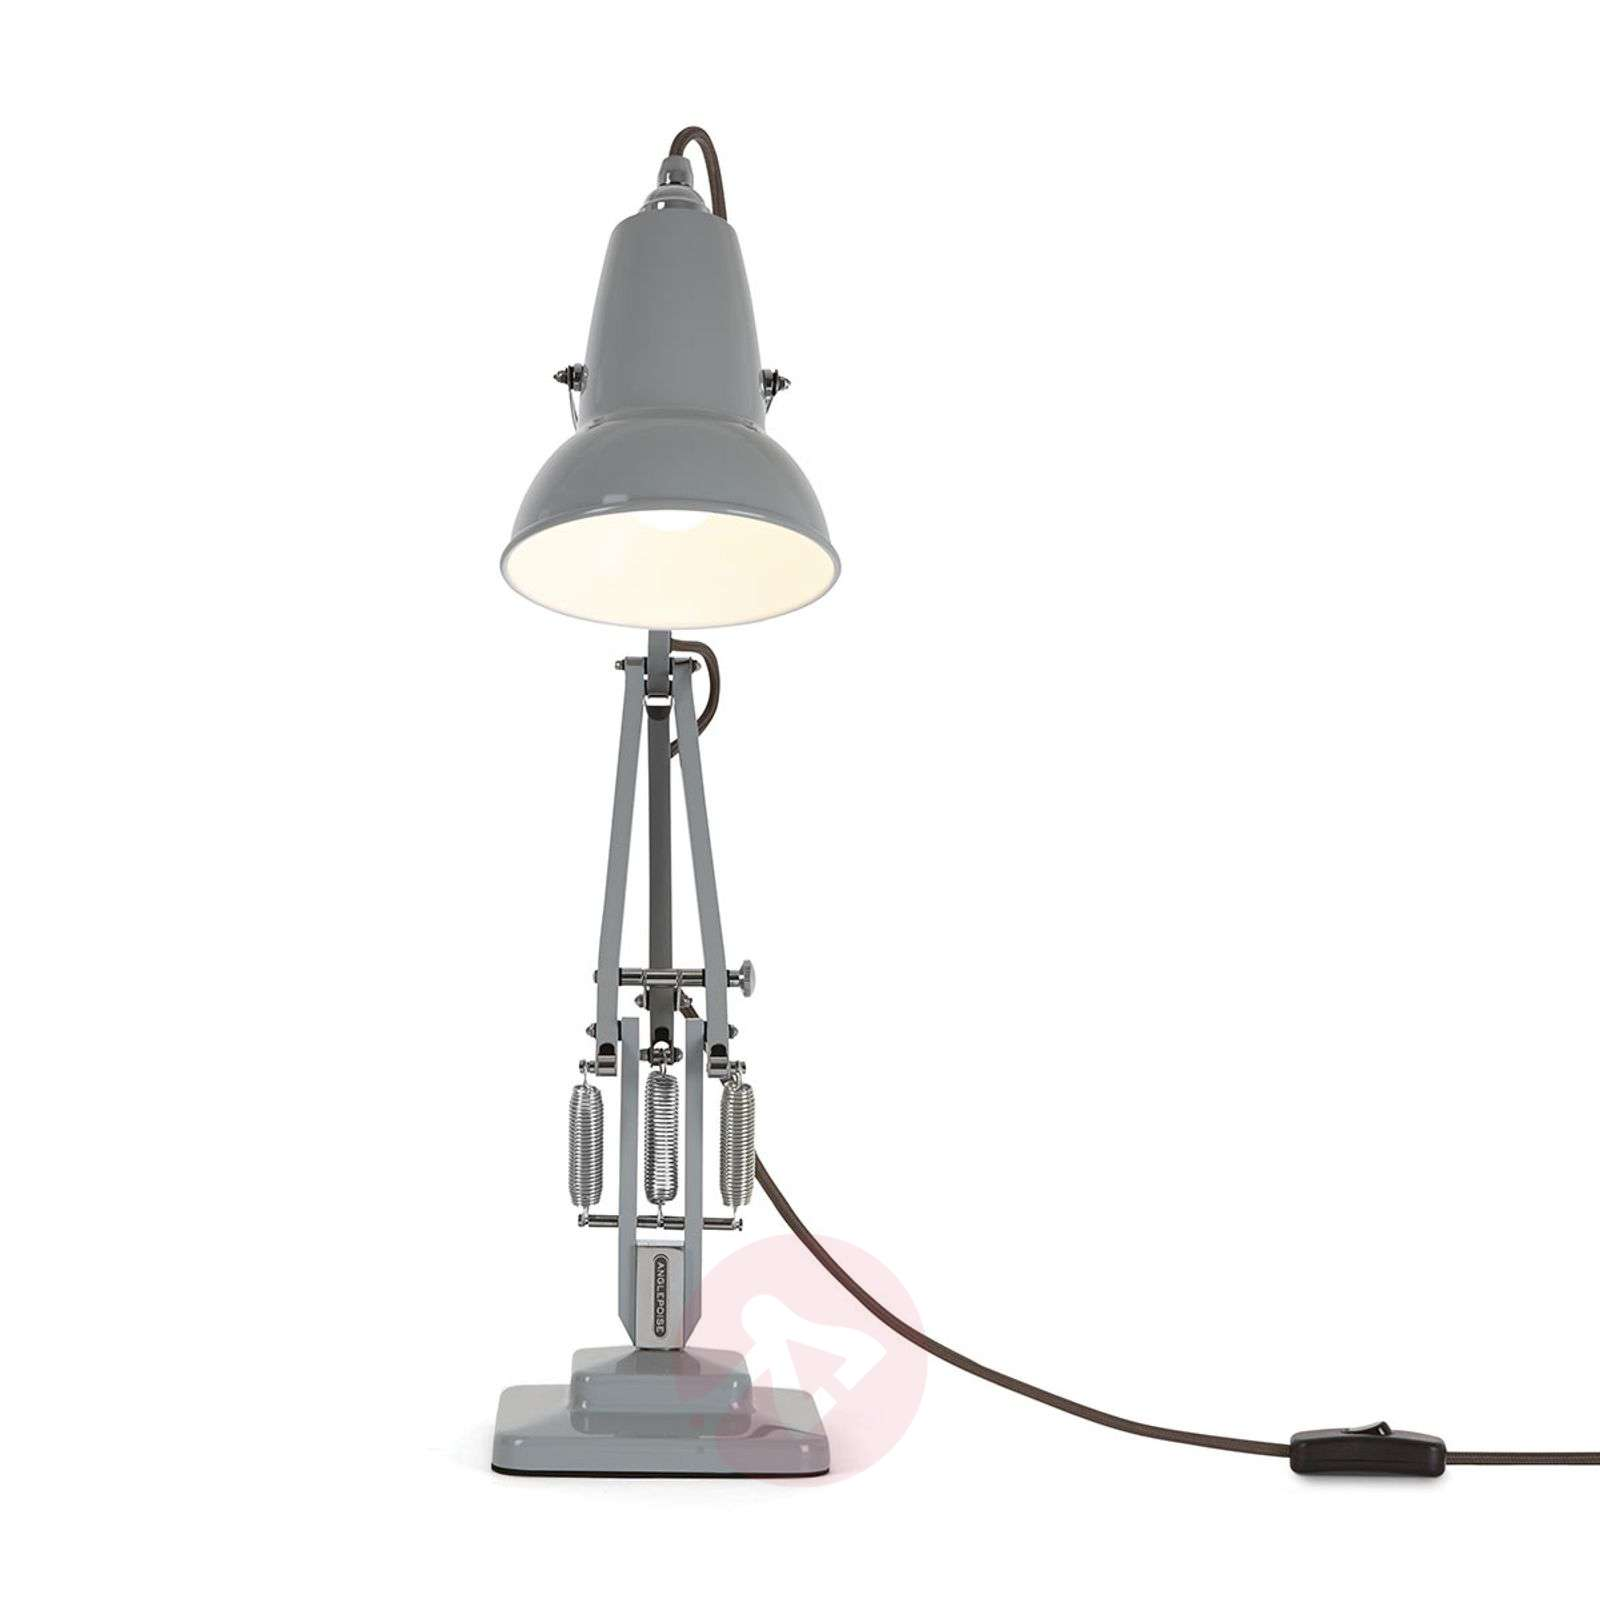 Anglepoise Original 1227 Mini table lamp-1073001X-01